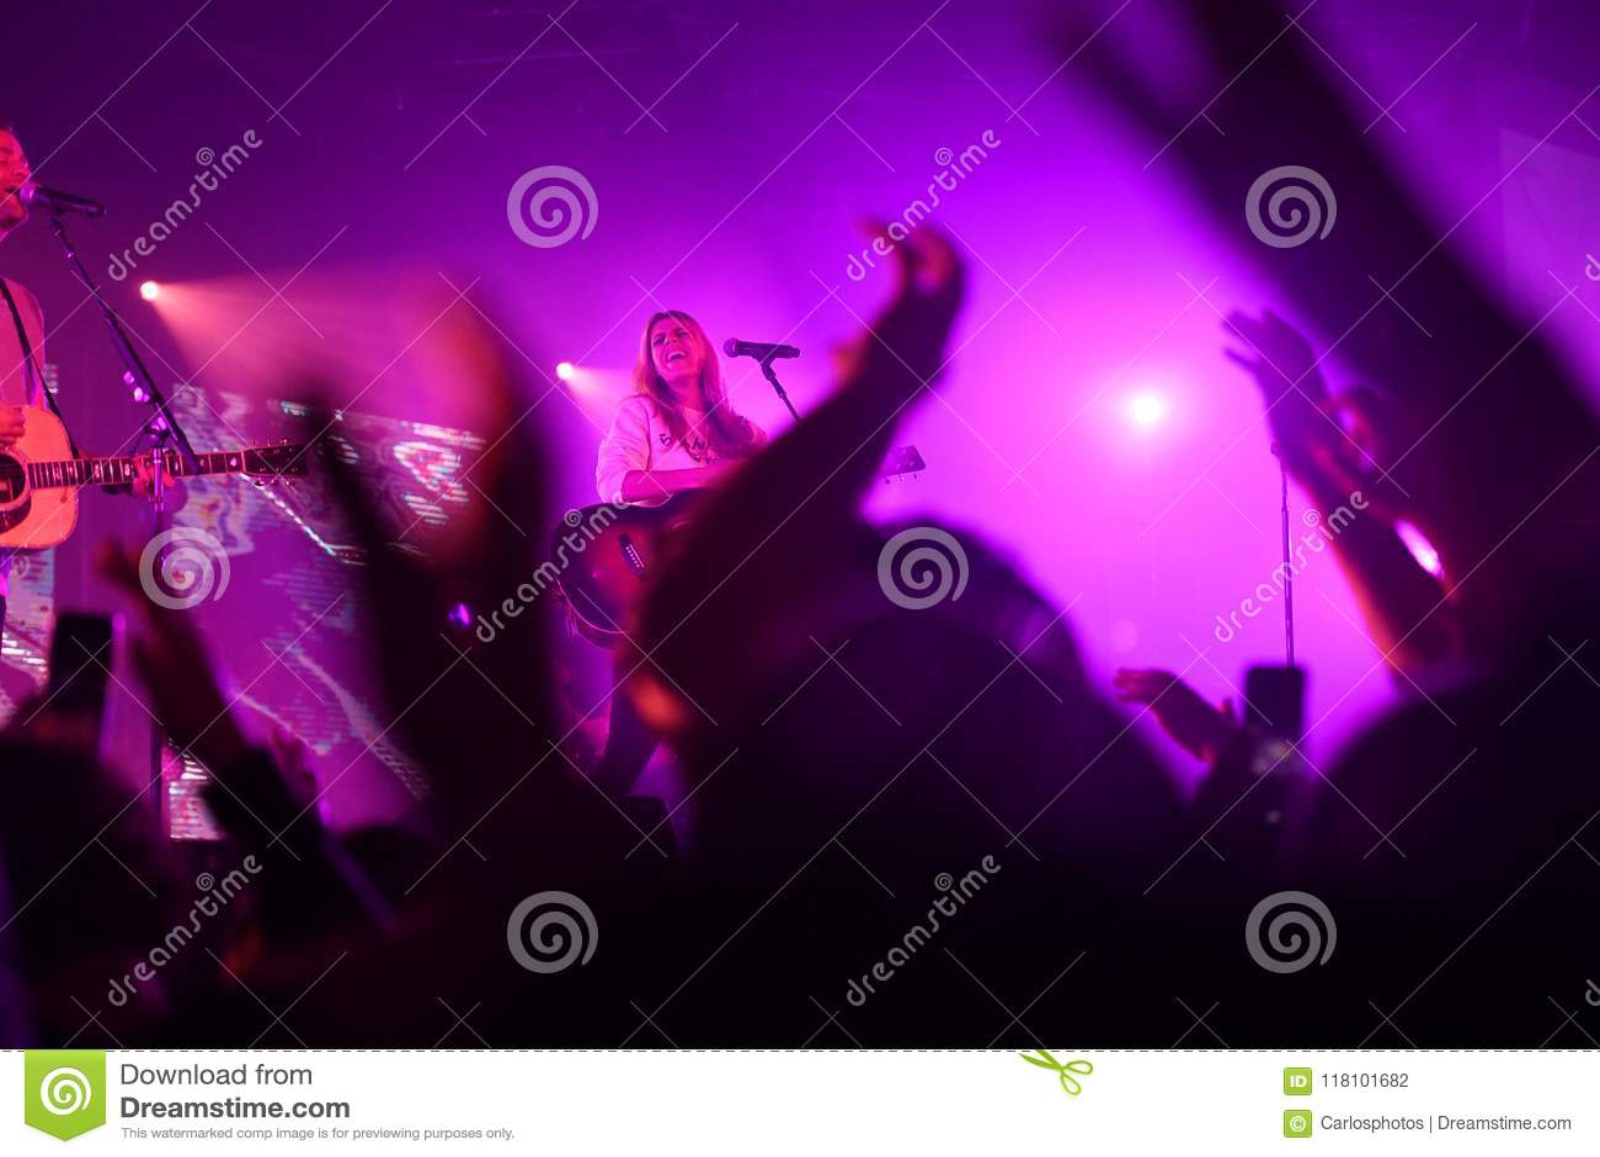 Hillsong Worship Performing In Saint Louis Missouri On April